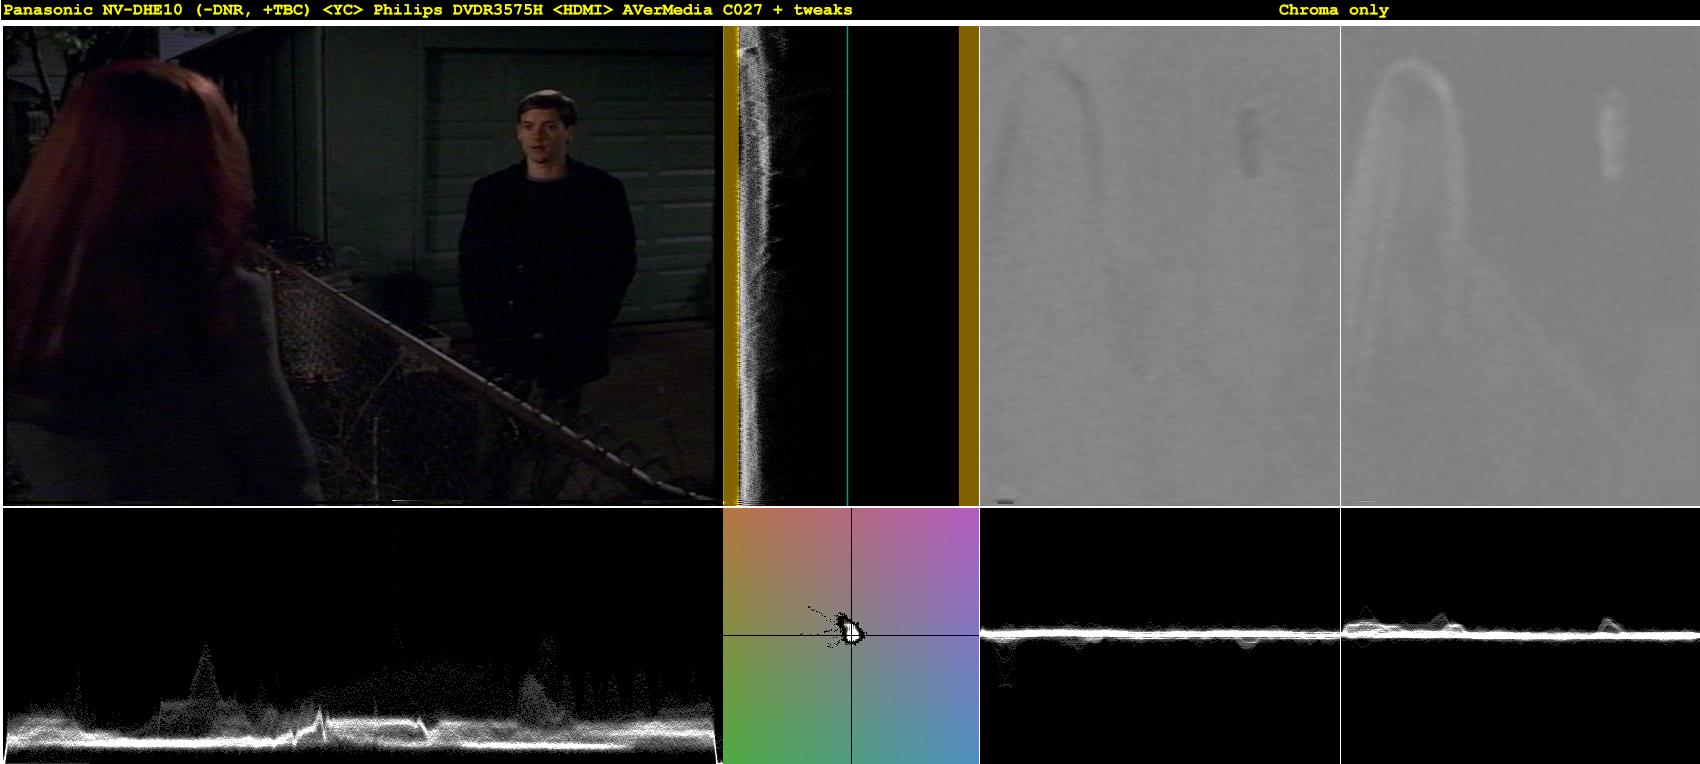 Click image for larger version  Name:0-37-50 - Panasonic NV-DHE10 (-DNR, +TBC).png Views:1045 Size:852.2 KB ID:37993